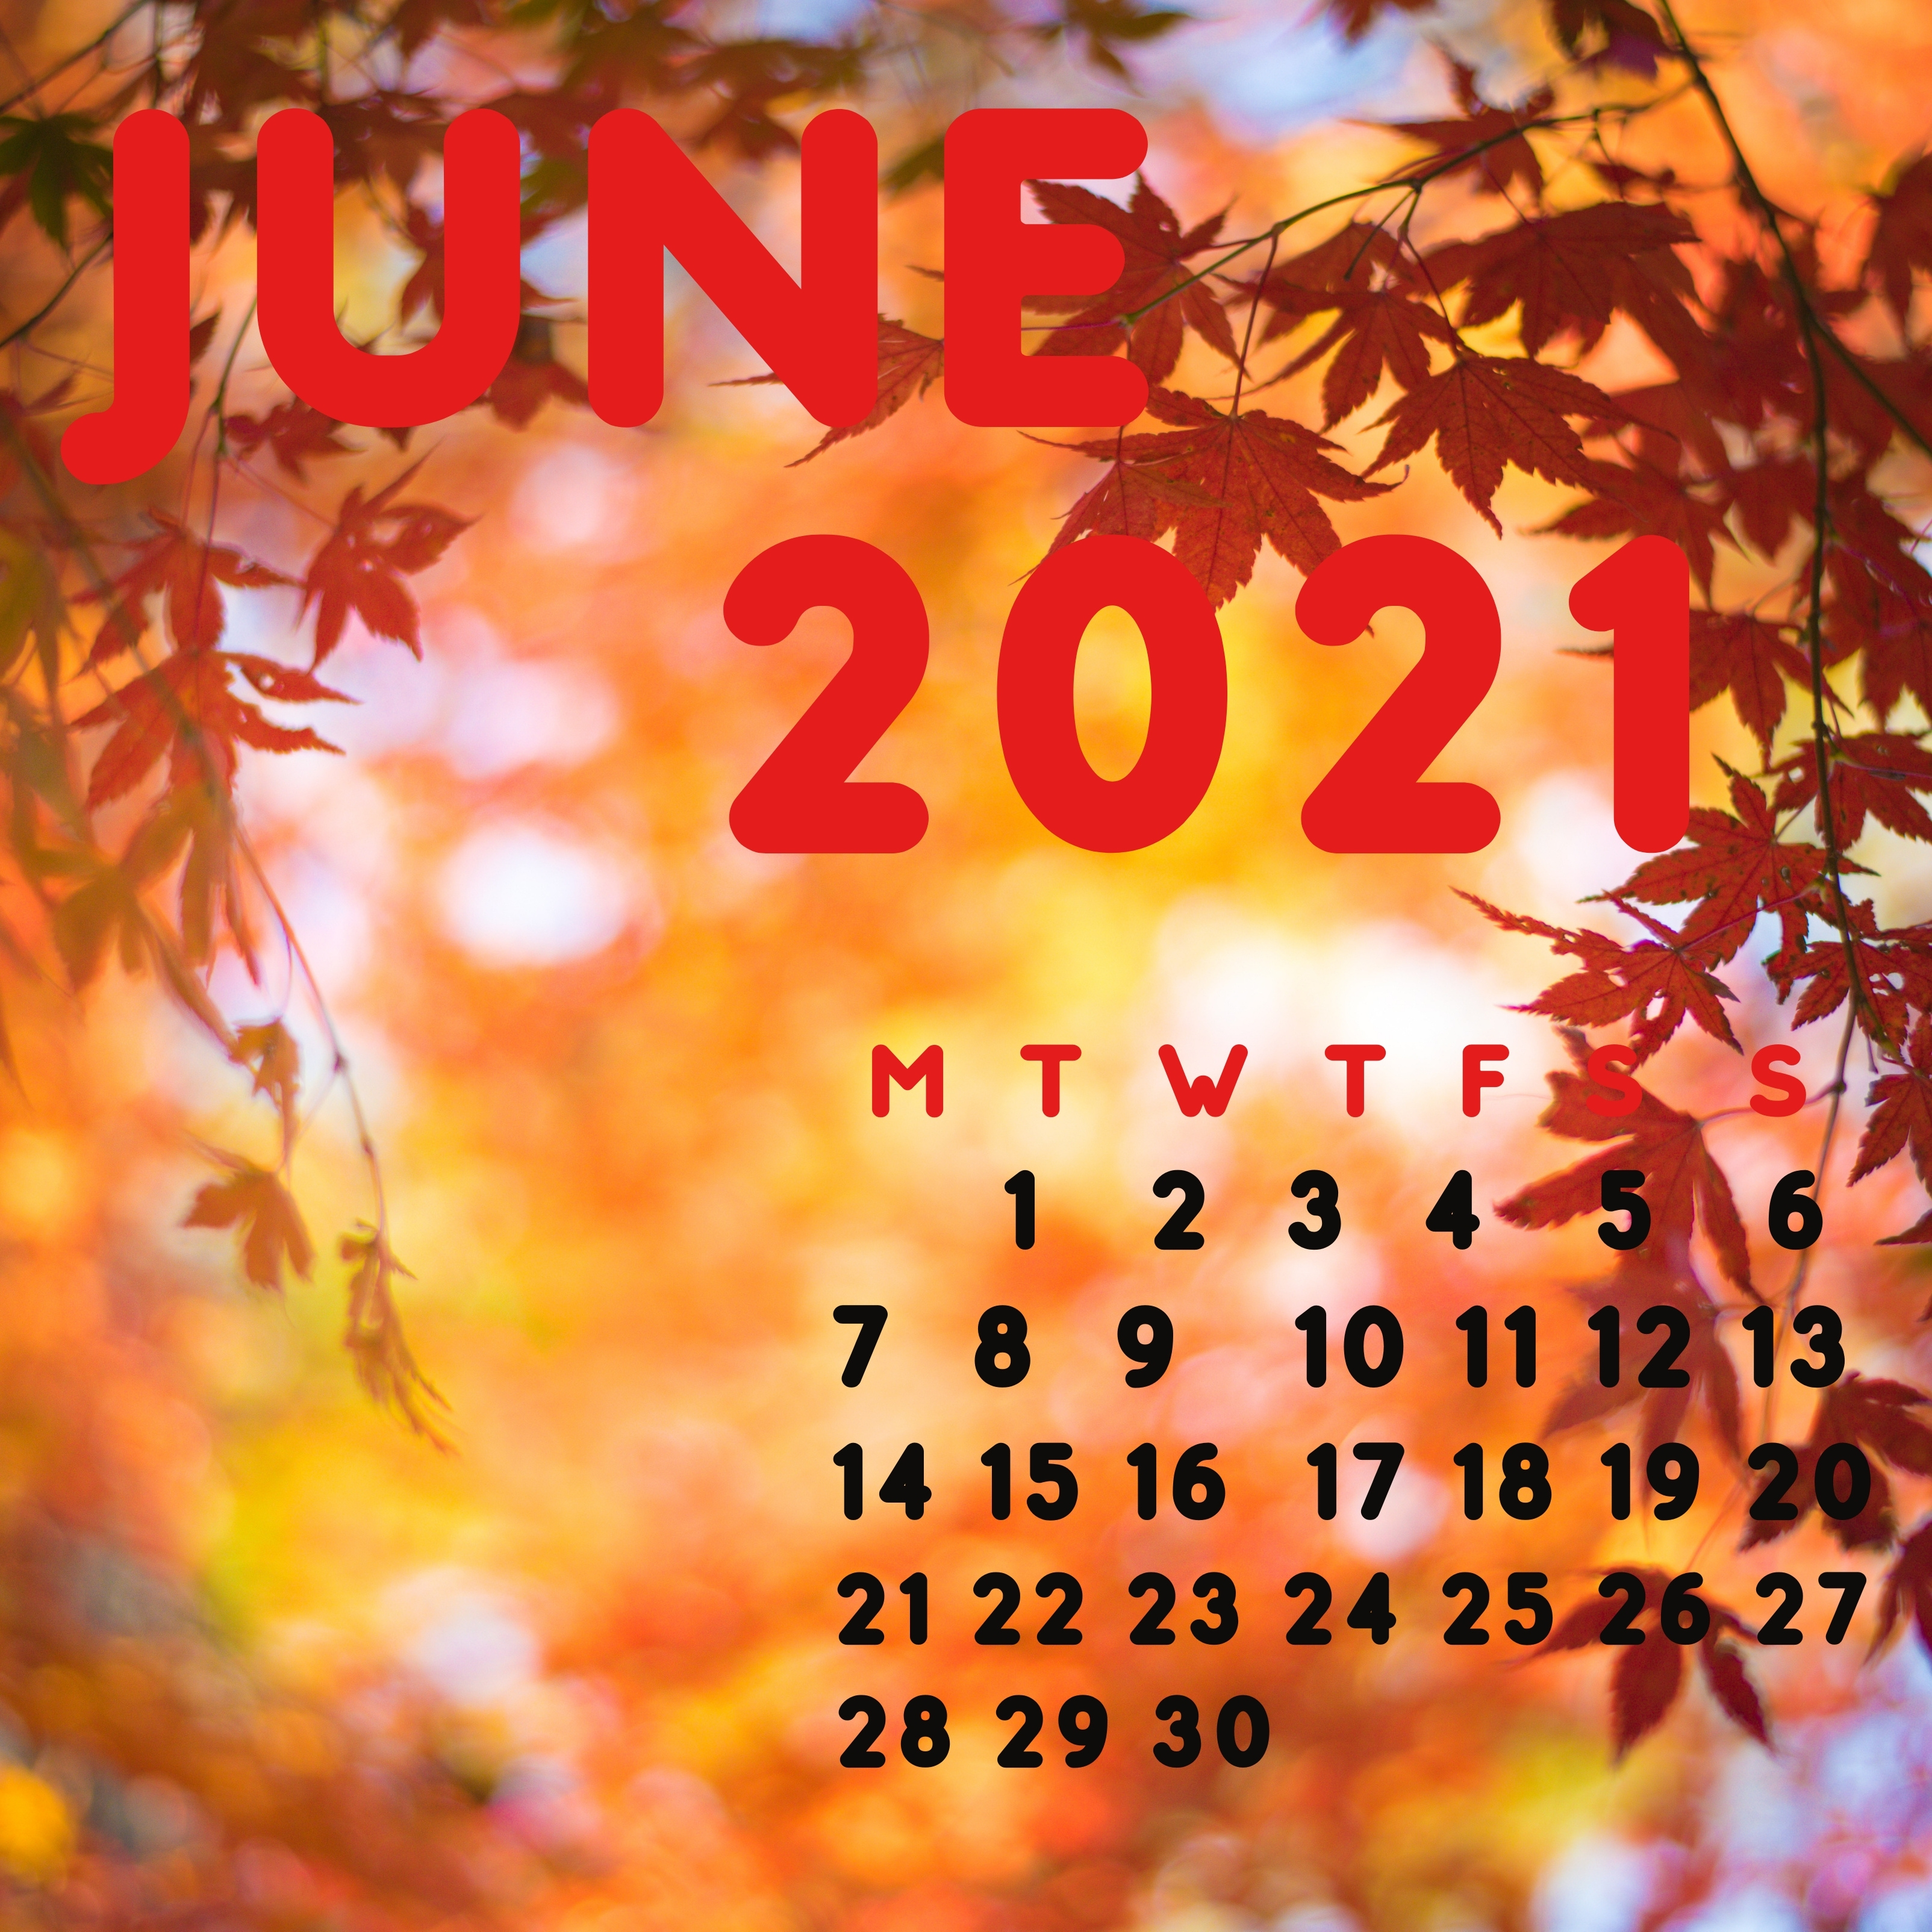 iPad Wallpapers June 2021 iPad Wallpaper 3208x3208 px